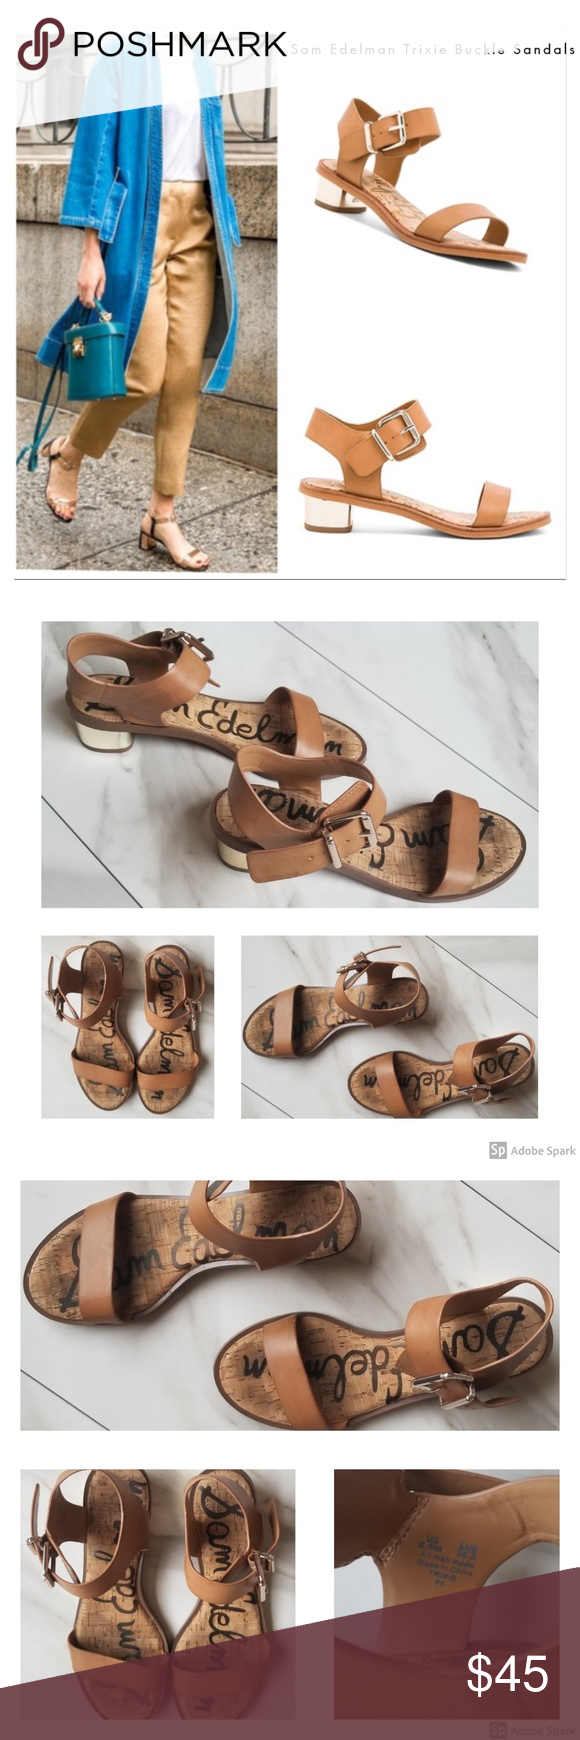 67b92861f0e7a8 Sam Edelman Trixie Camel Sandals